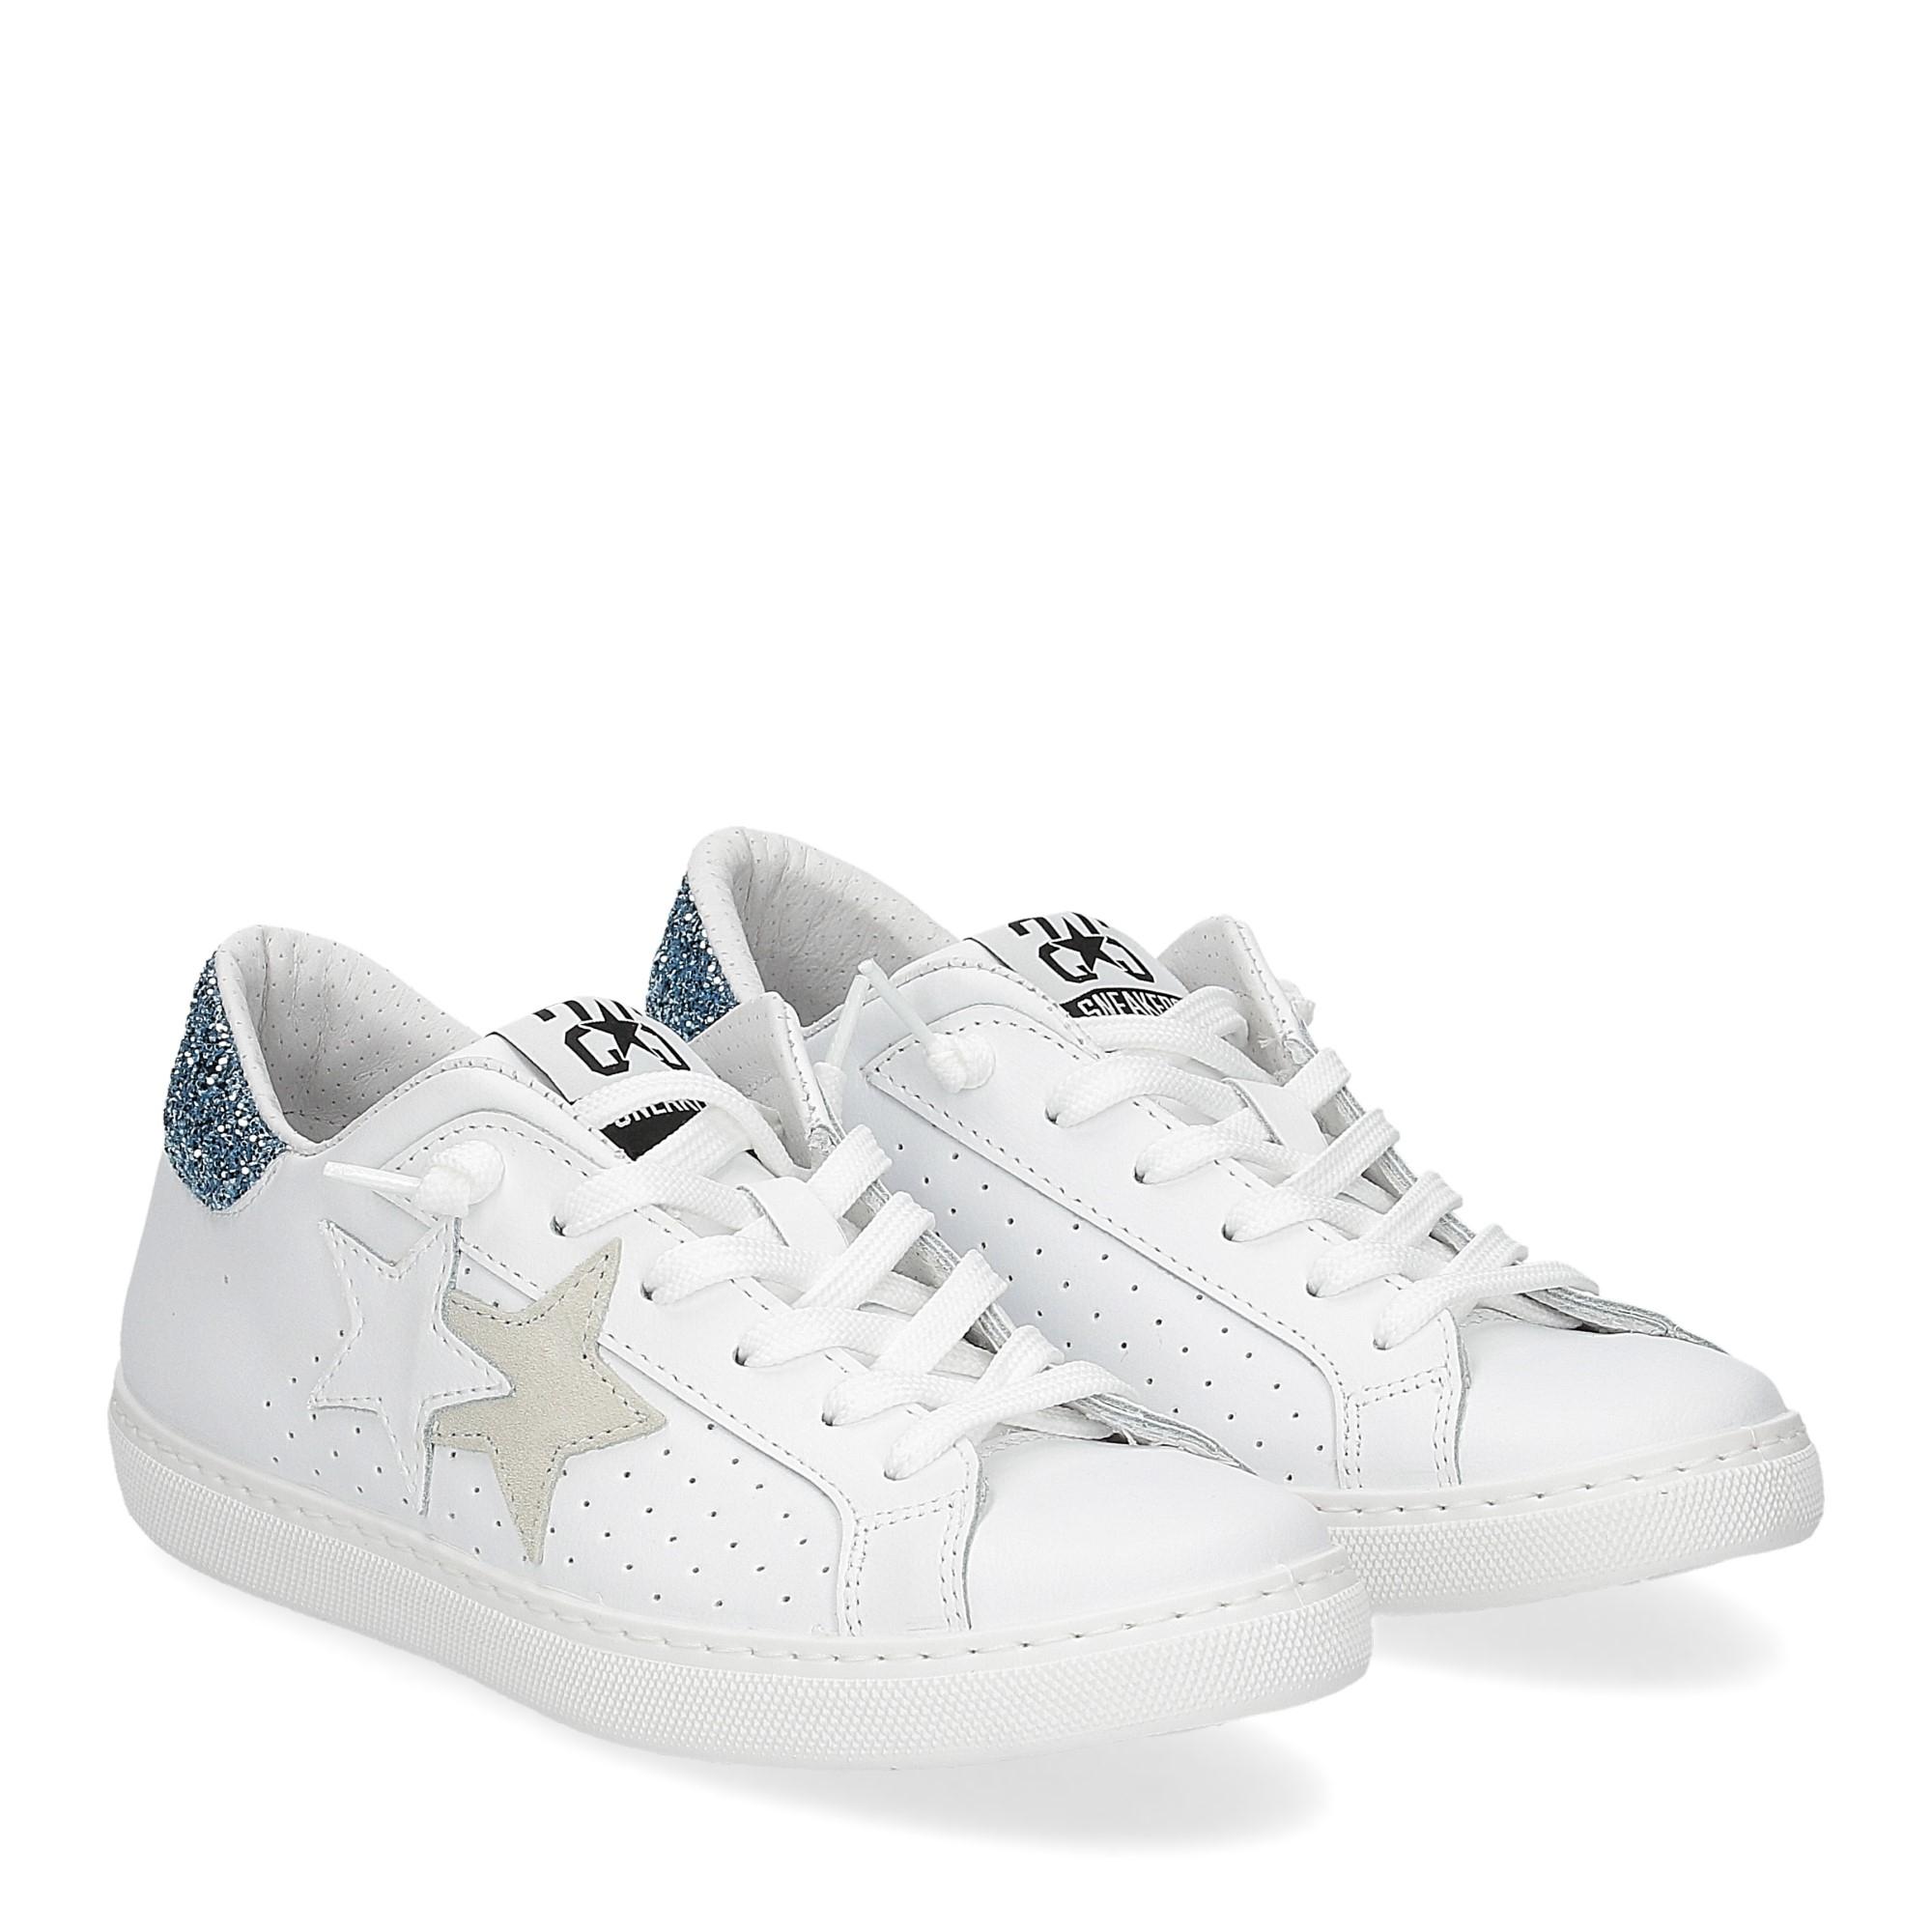 2Star 2611 sneaker low bianco celeste